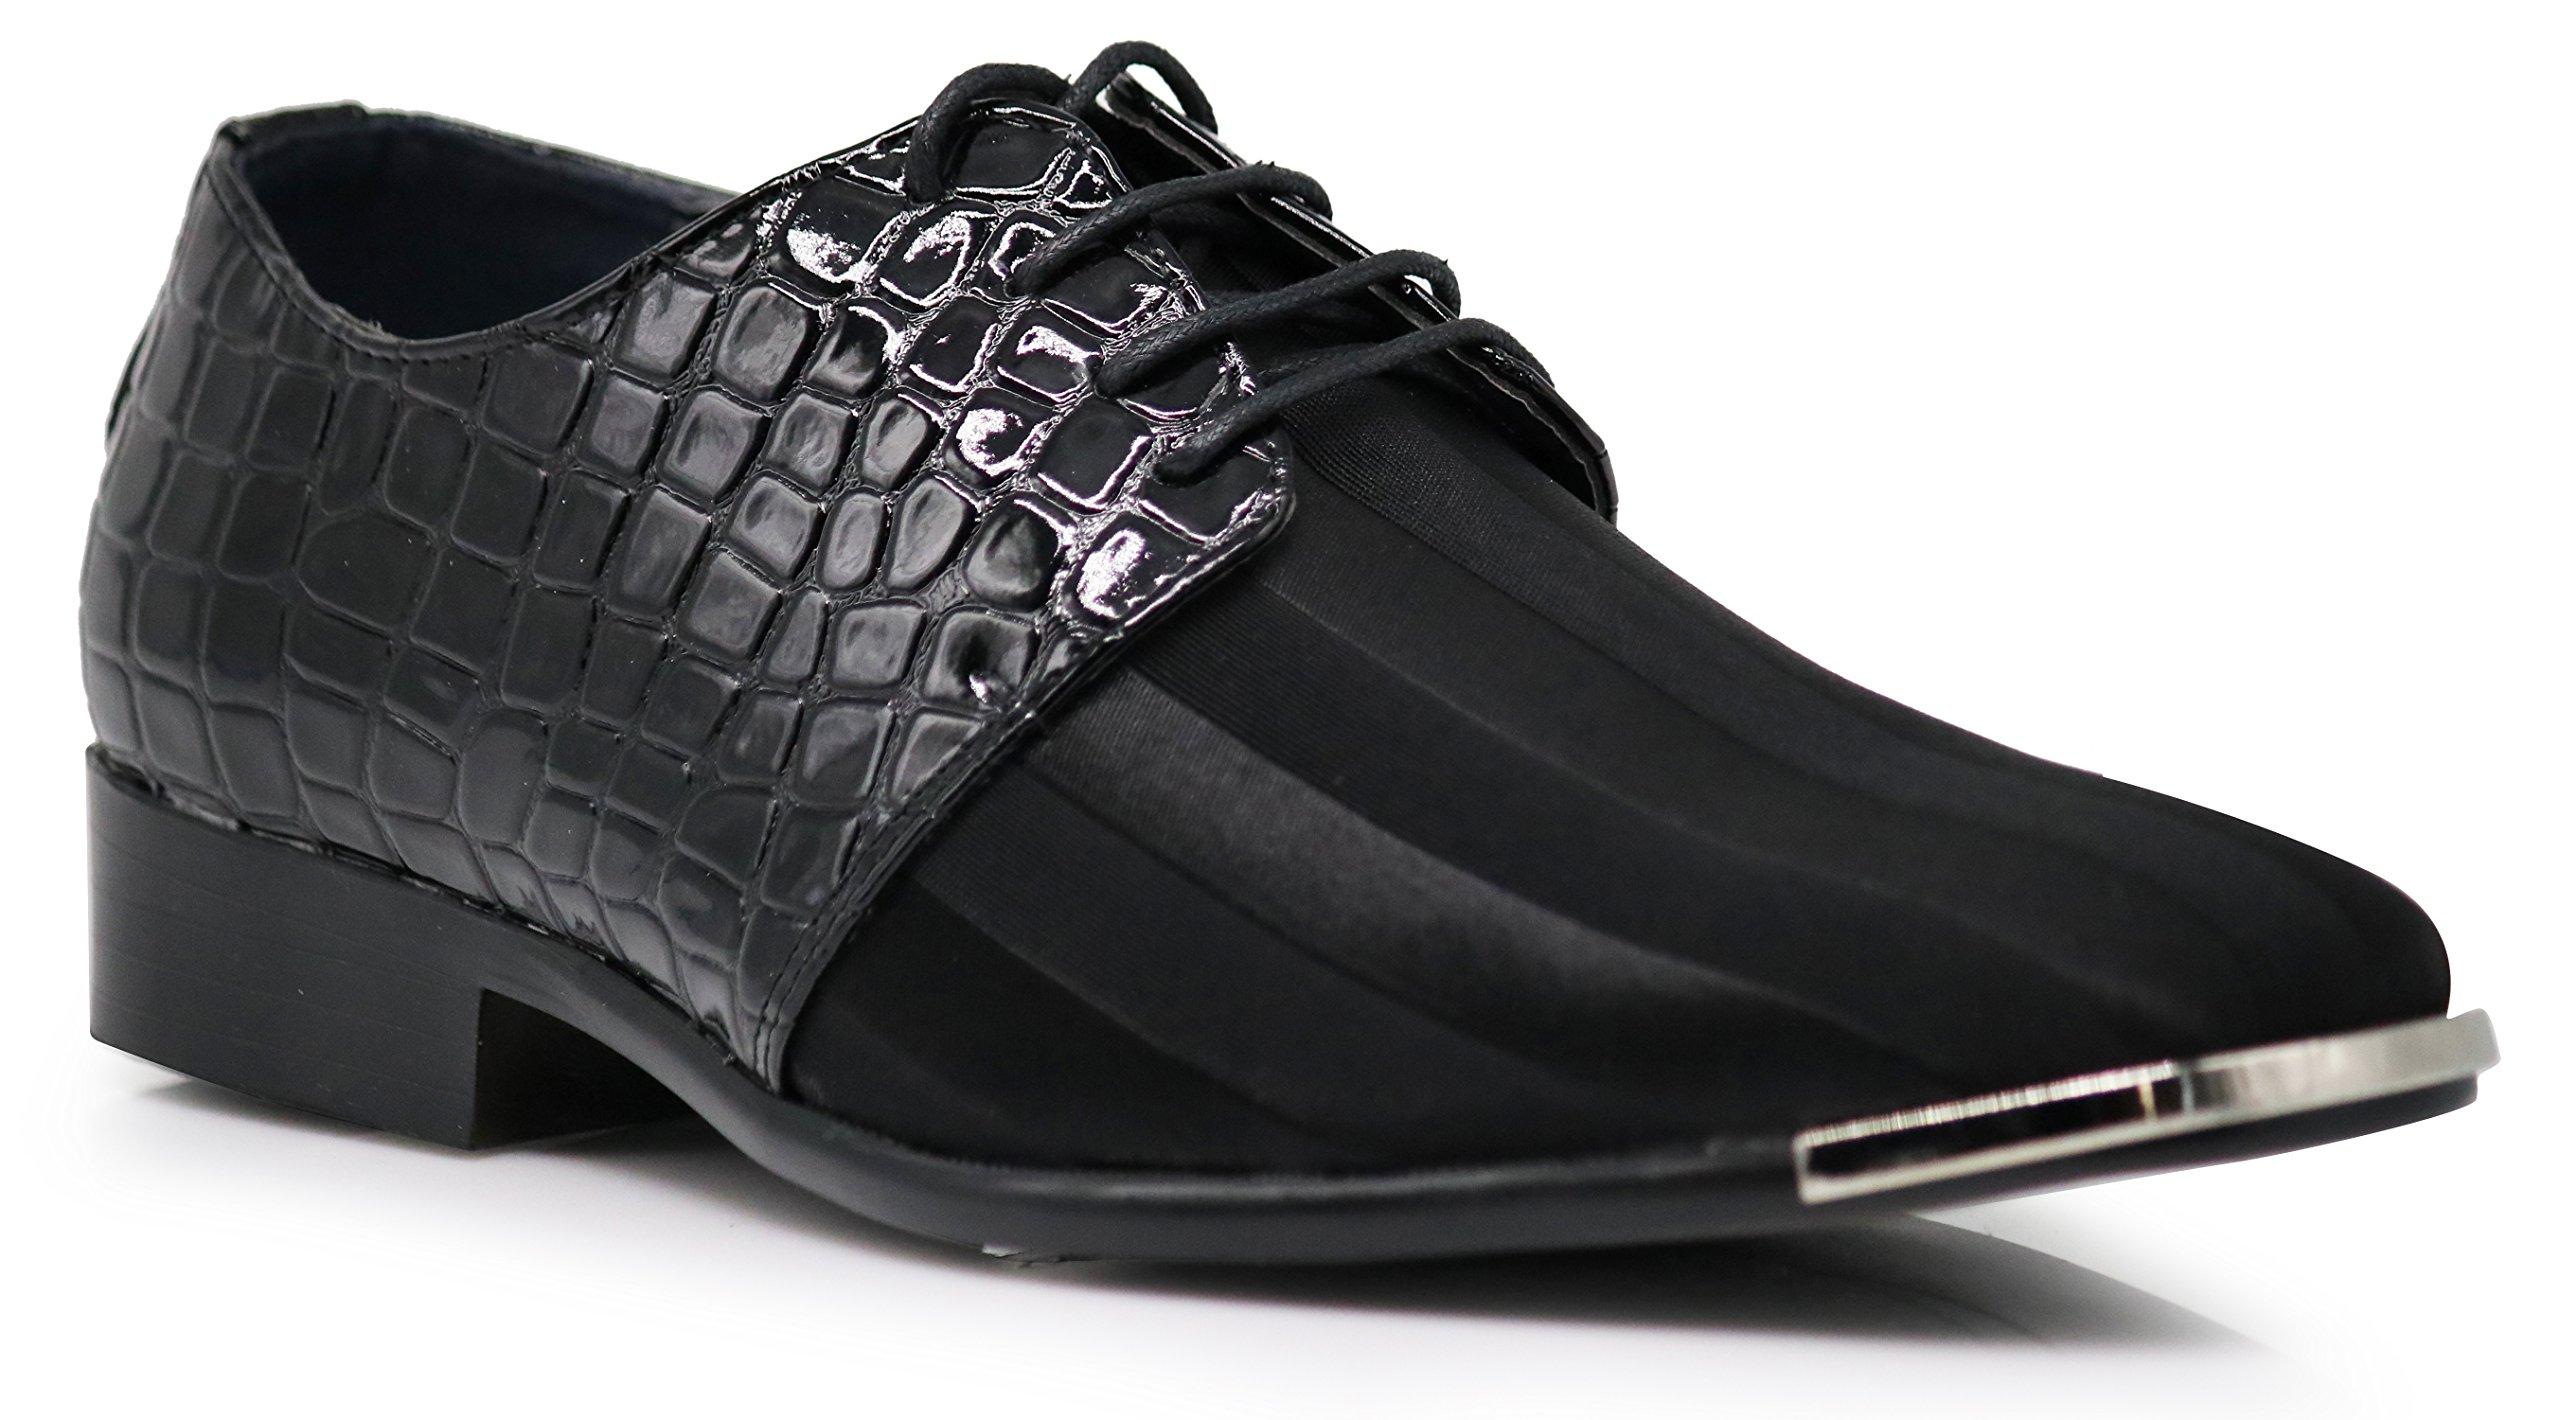 JY2N Men's Satin Metal Silver Tip Oxfords Dress Shoes Stripes Church Wedding Party Groomsmen Oxfords Dress Shoes (10, Black)